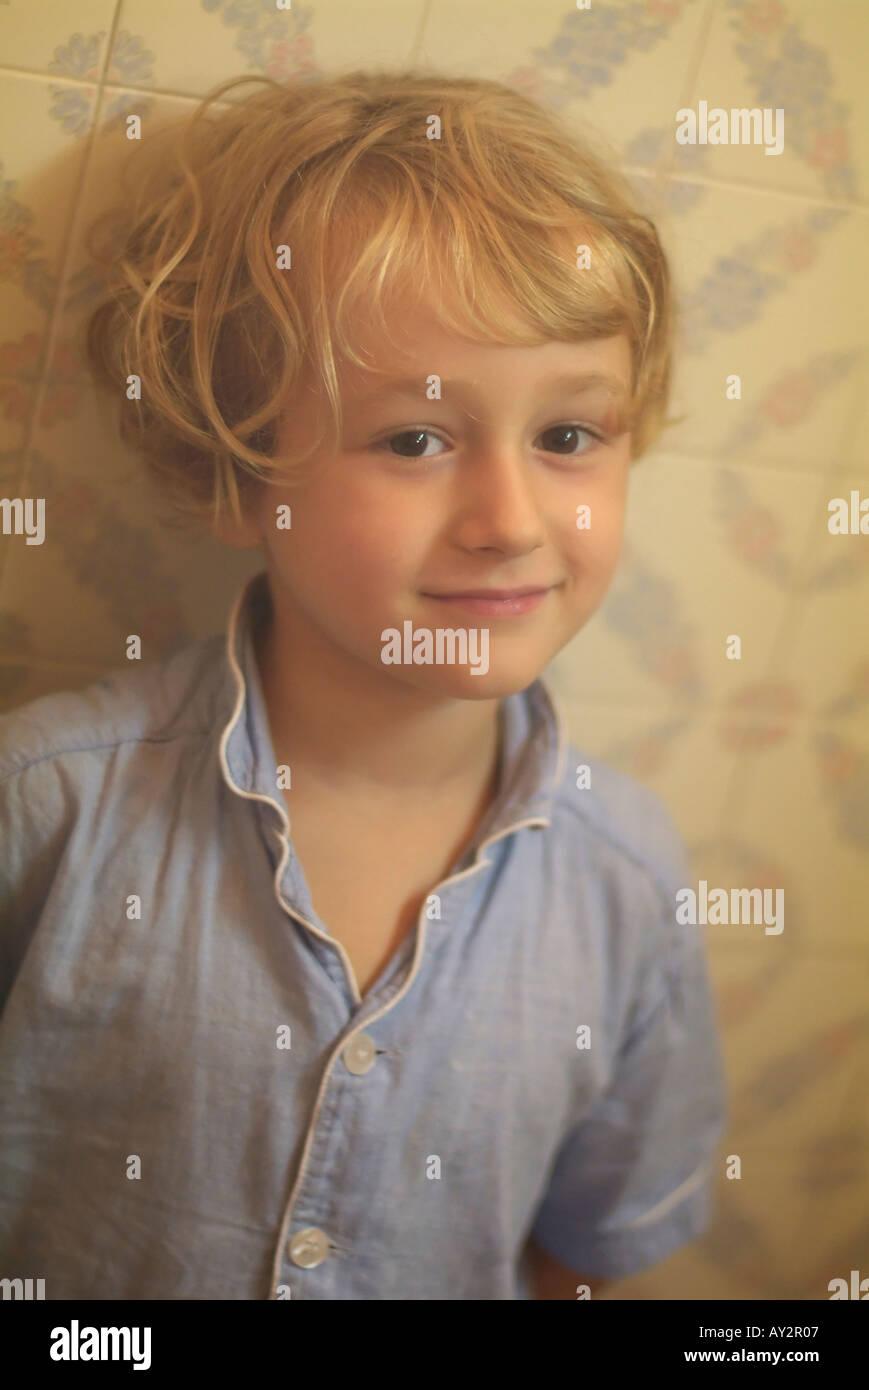 Little girl in a steamy bathroom. Stock Photo